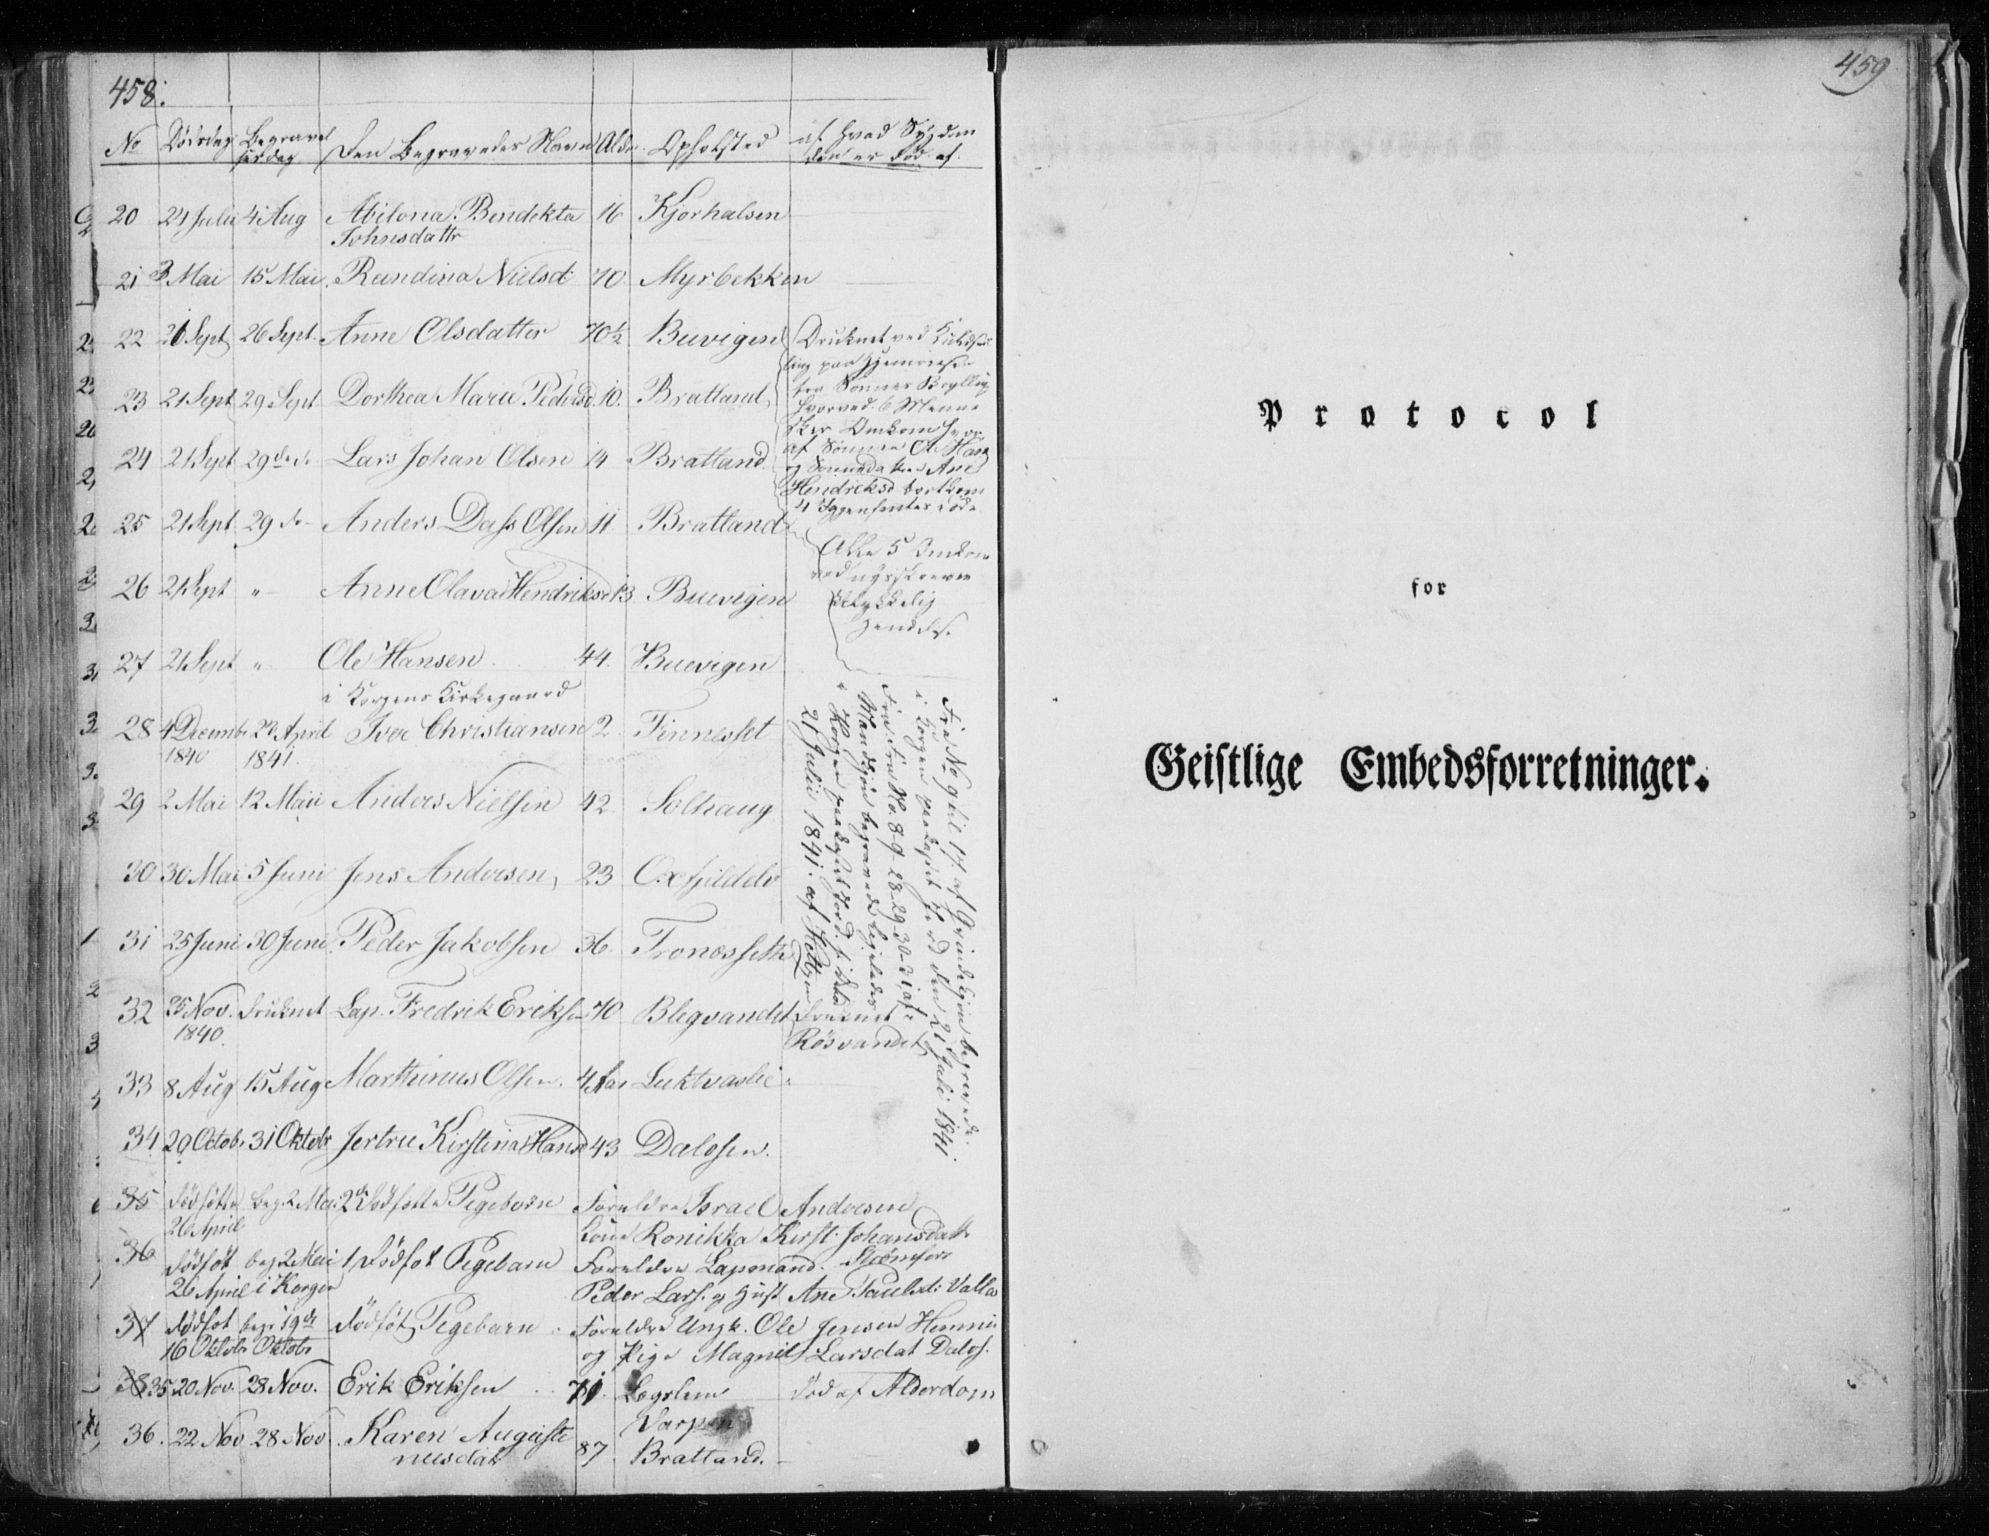 SAT, Ministerialprotokoller, klokkerbøker og fødselsregistre - Nordland, 825/L0354: Ministerialbok nr. 825A08, 1826-1841, s. 458-459